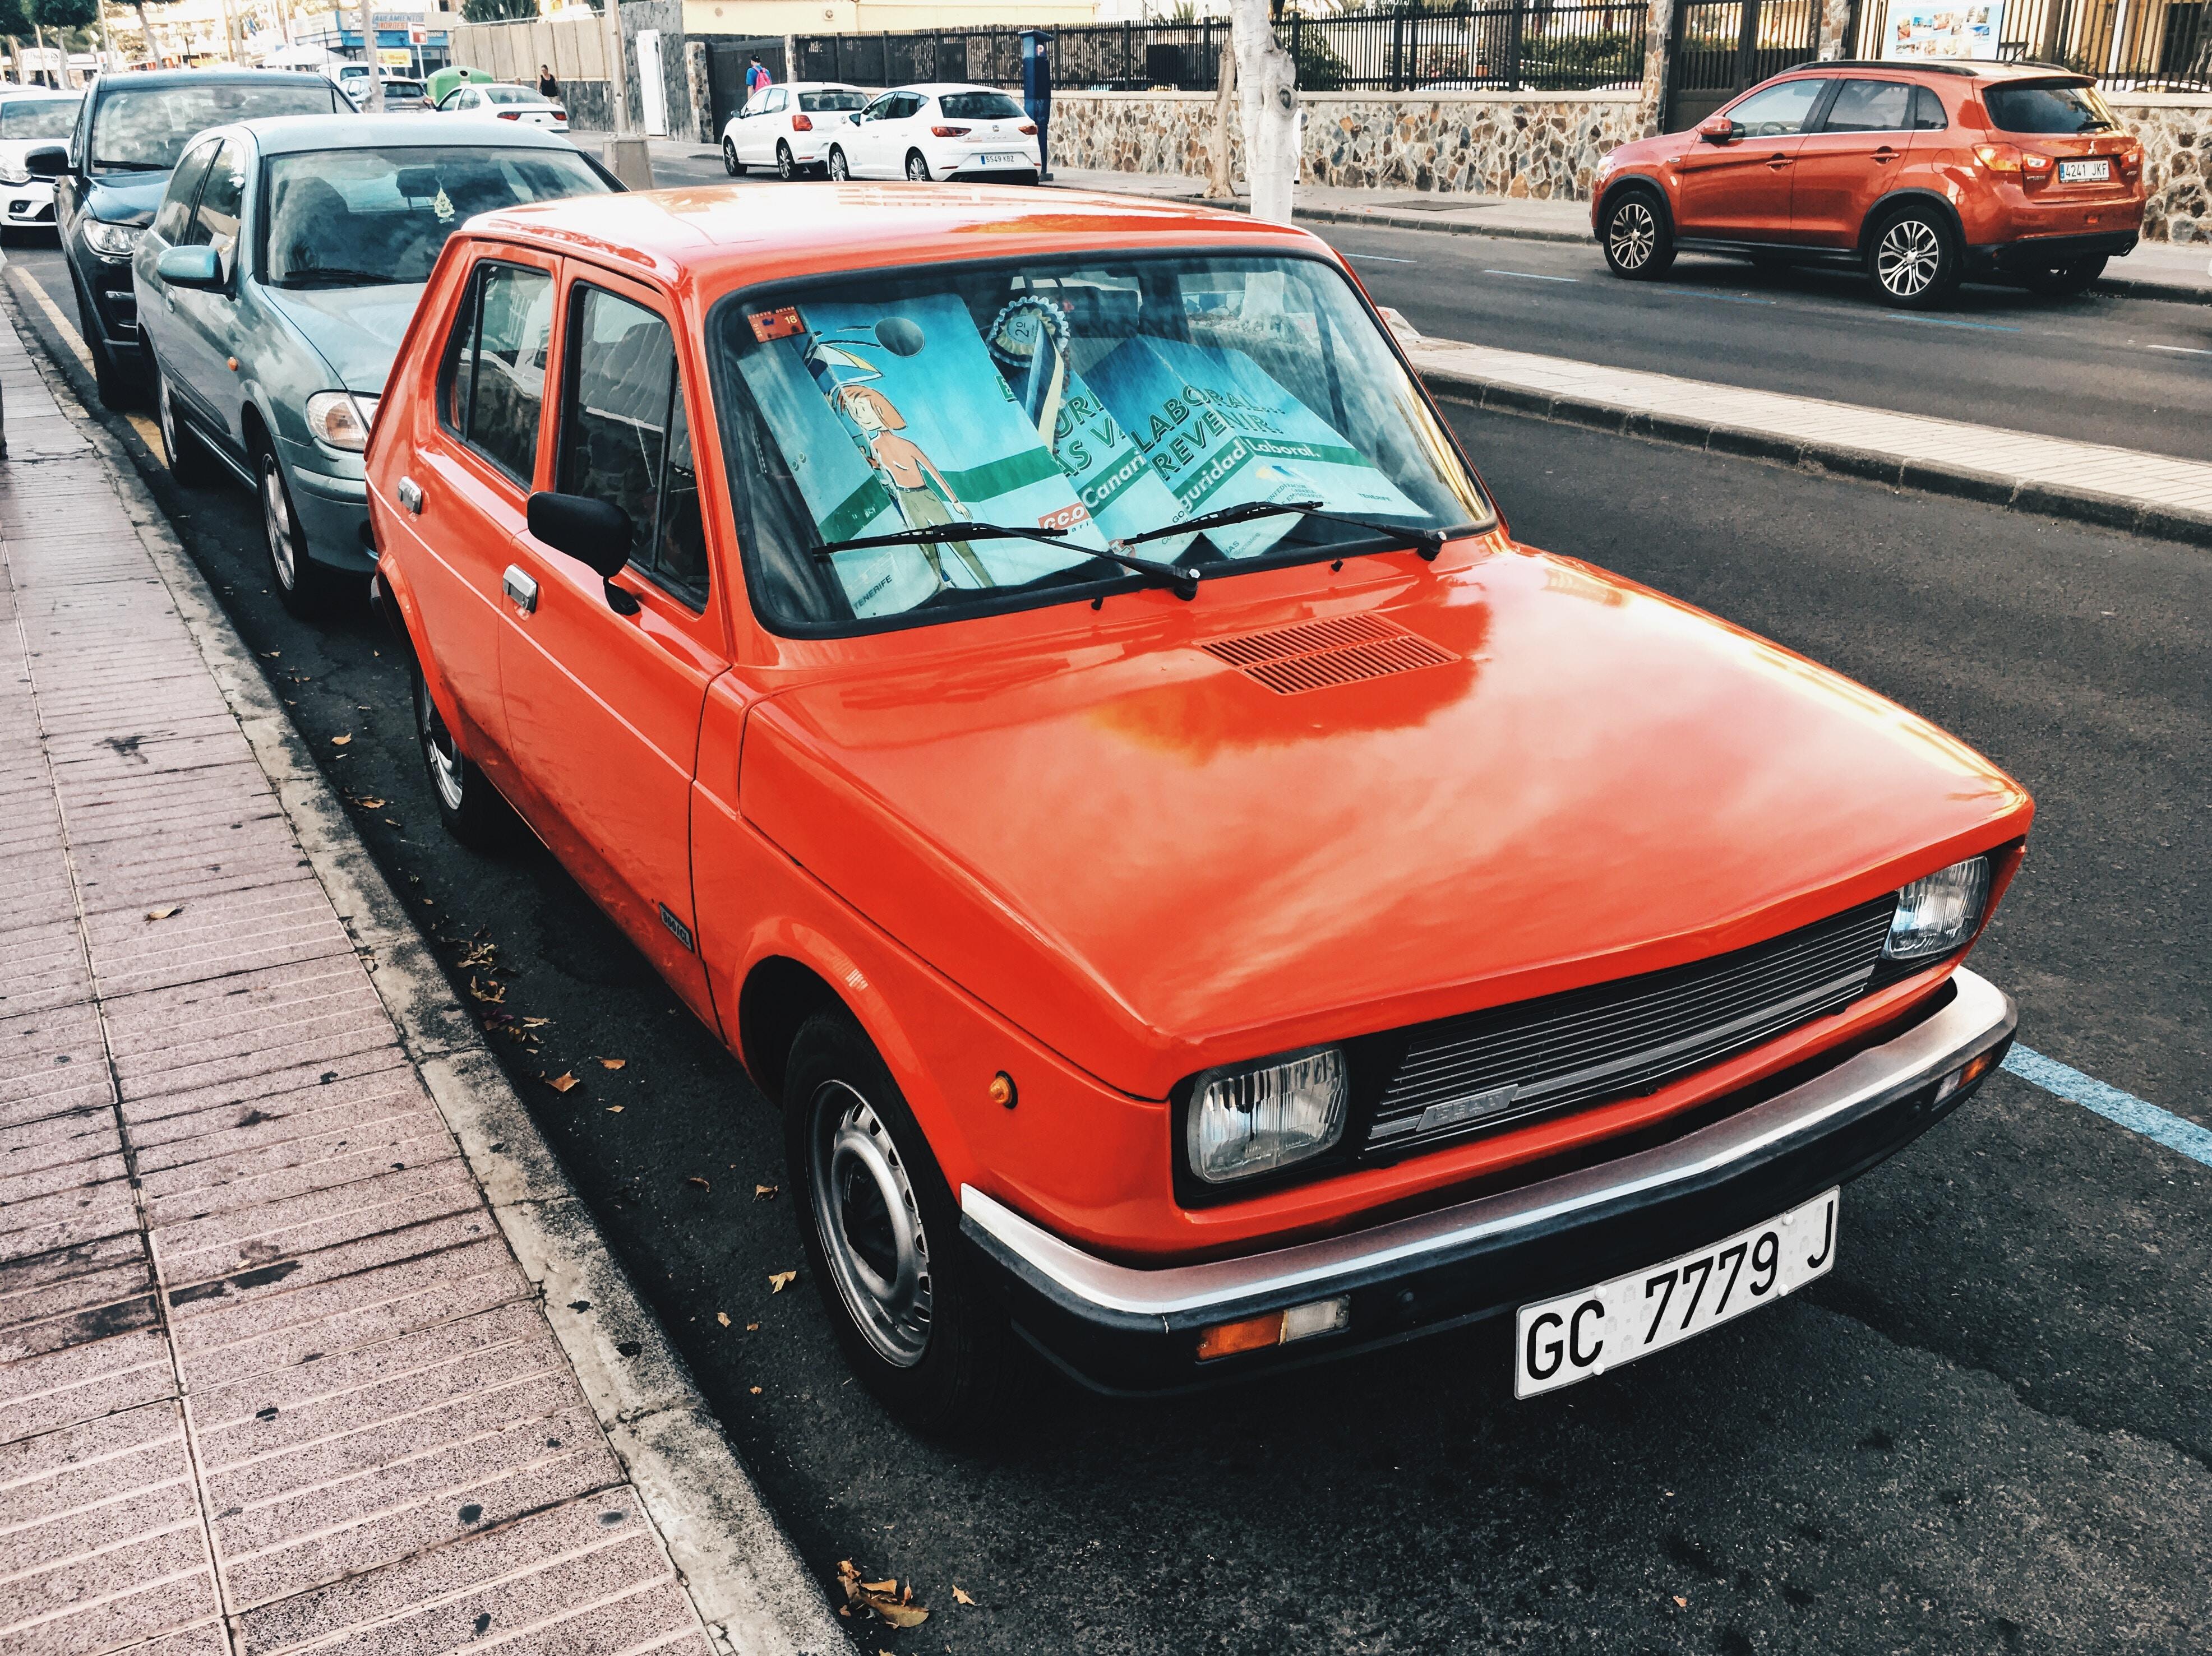 red 5-door hatchback parked near concrete curb